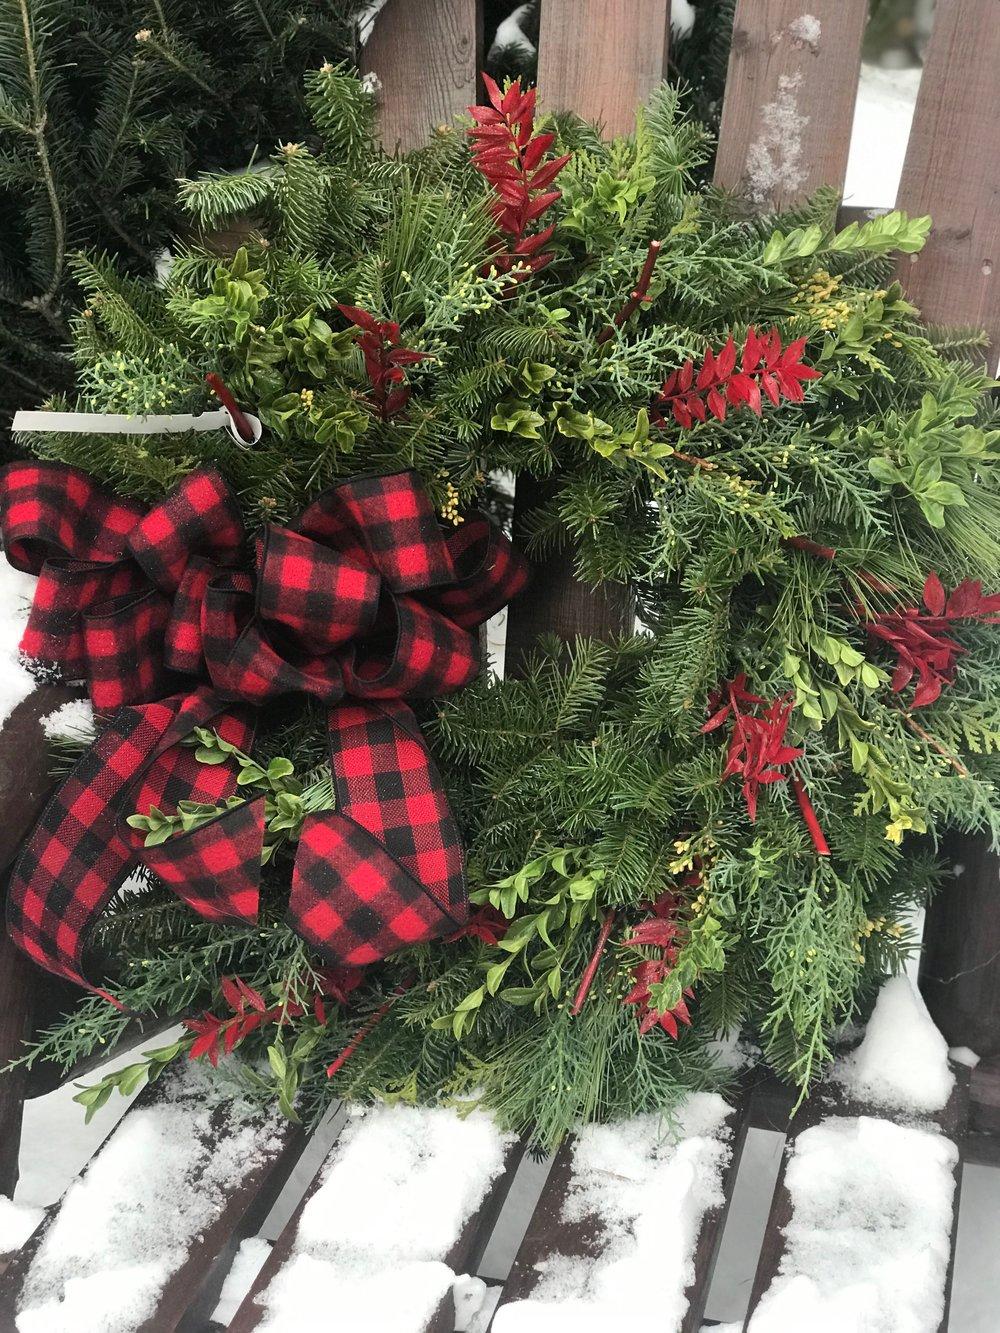 Handmade mixed pine wreaths.